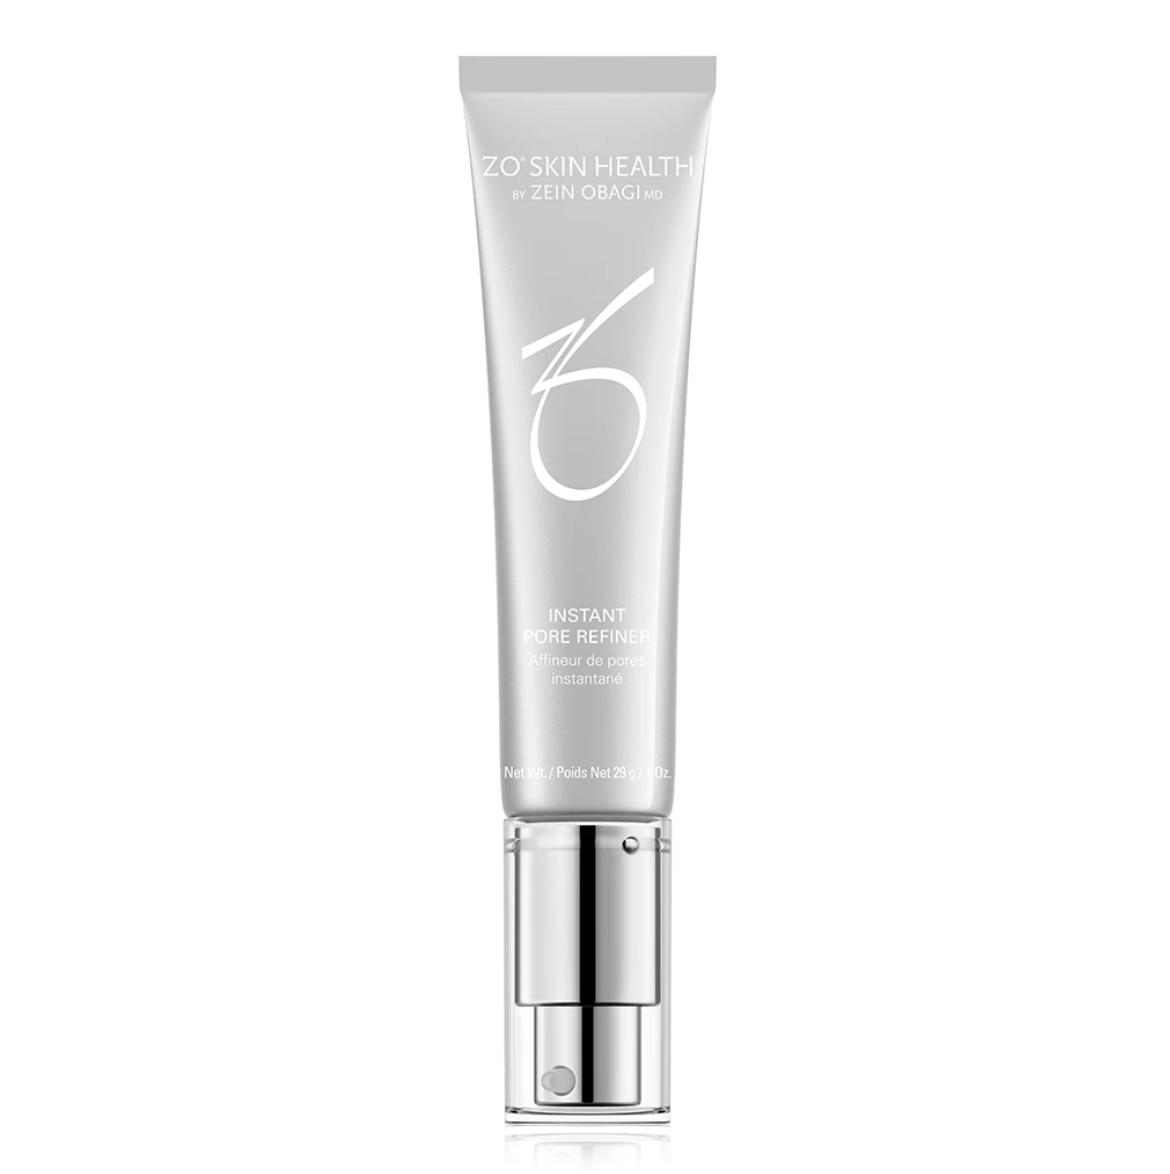 ZO Skin Health Instant Pore Refiner